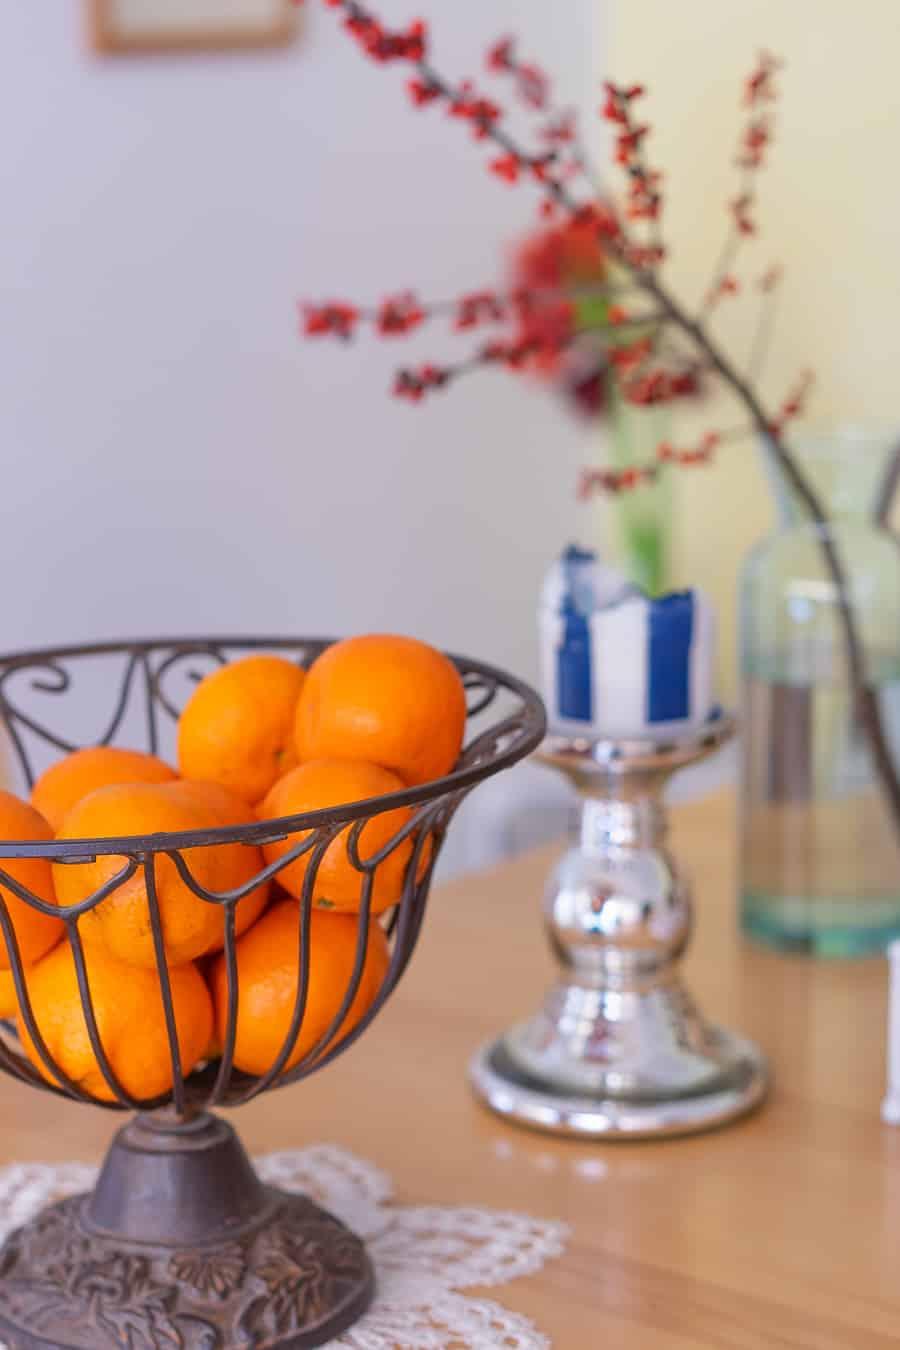 Wochenglück-Rückblick - Mandarinen im Korb